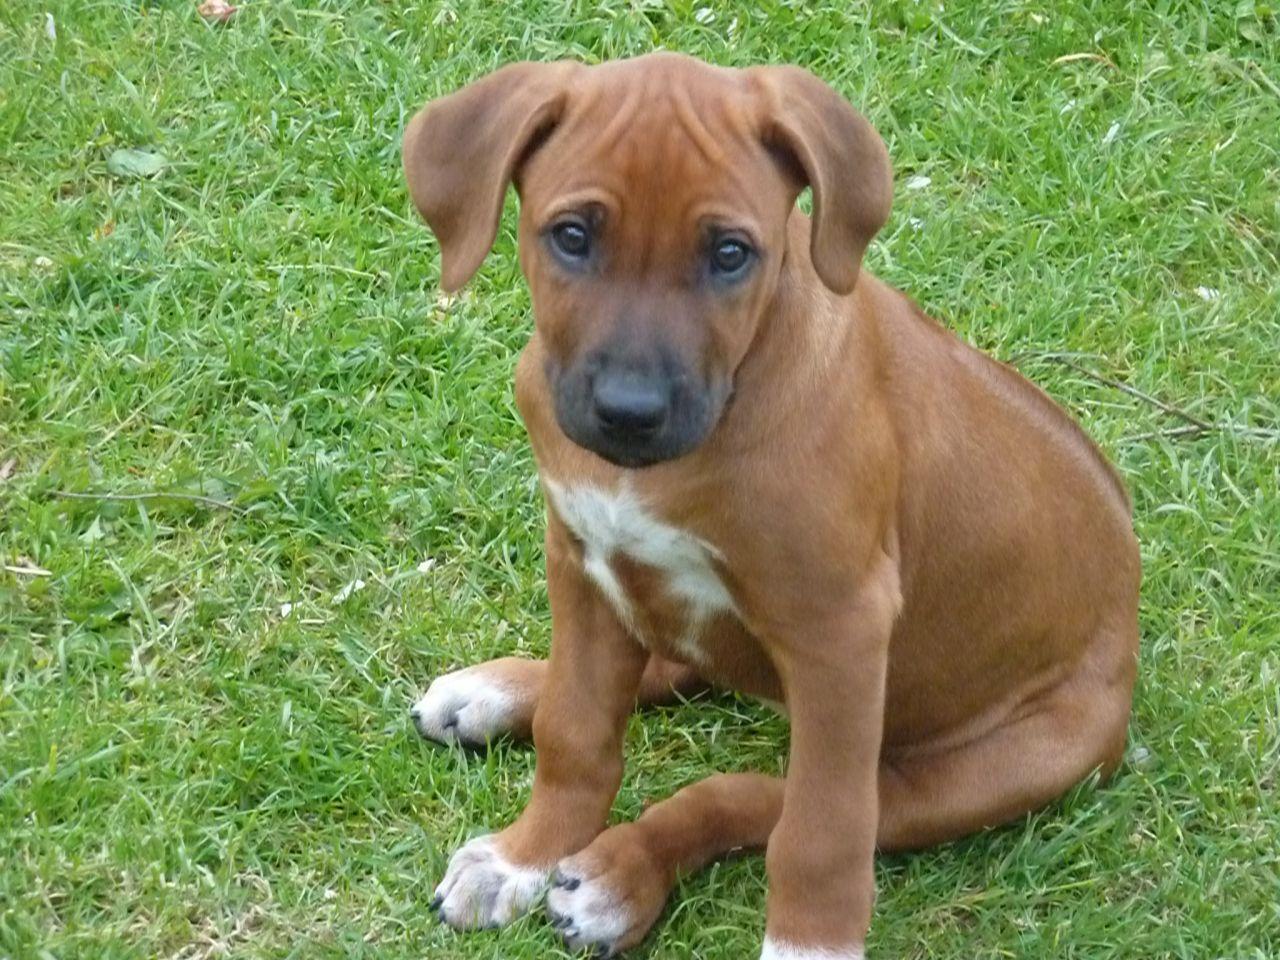 Rhodesian Ridgeback Dog: Rhodesian Httpccmedienmarktdecbildercccccddabcmediumccrhodesiawelpenohnepapierejpg Breed